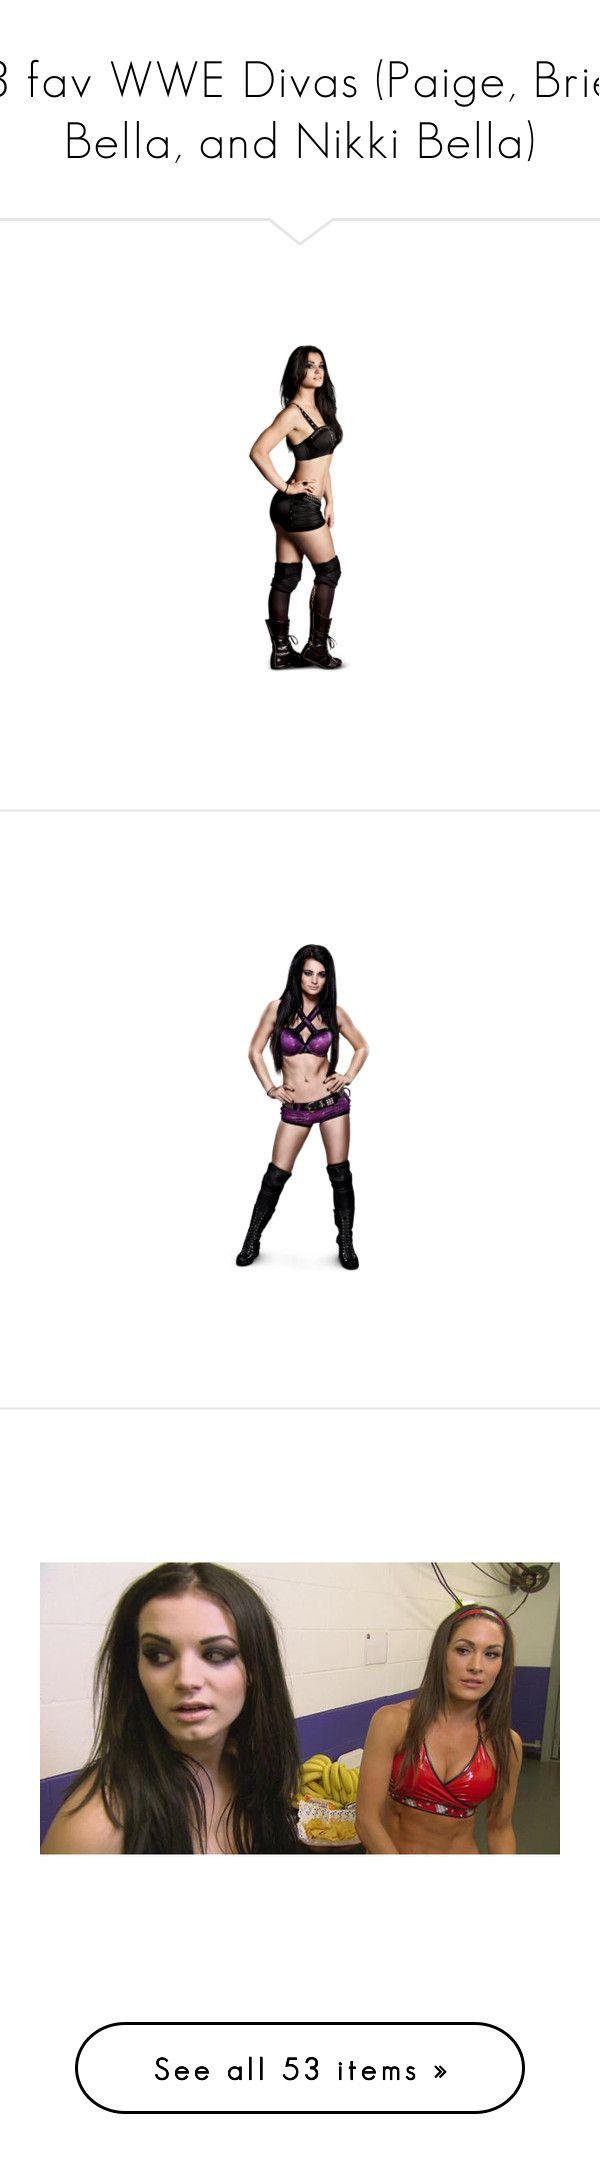 3 fav WWE Divas (Paige, Brie Bella, and Nikki Bella) by lost-moon.   Get well soon, Nikki!